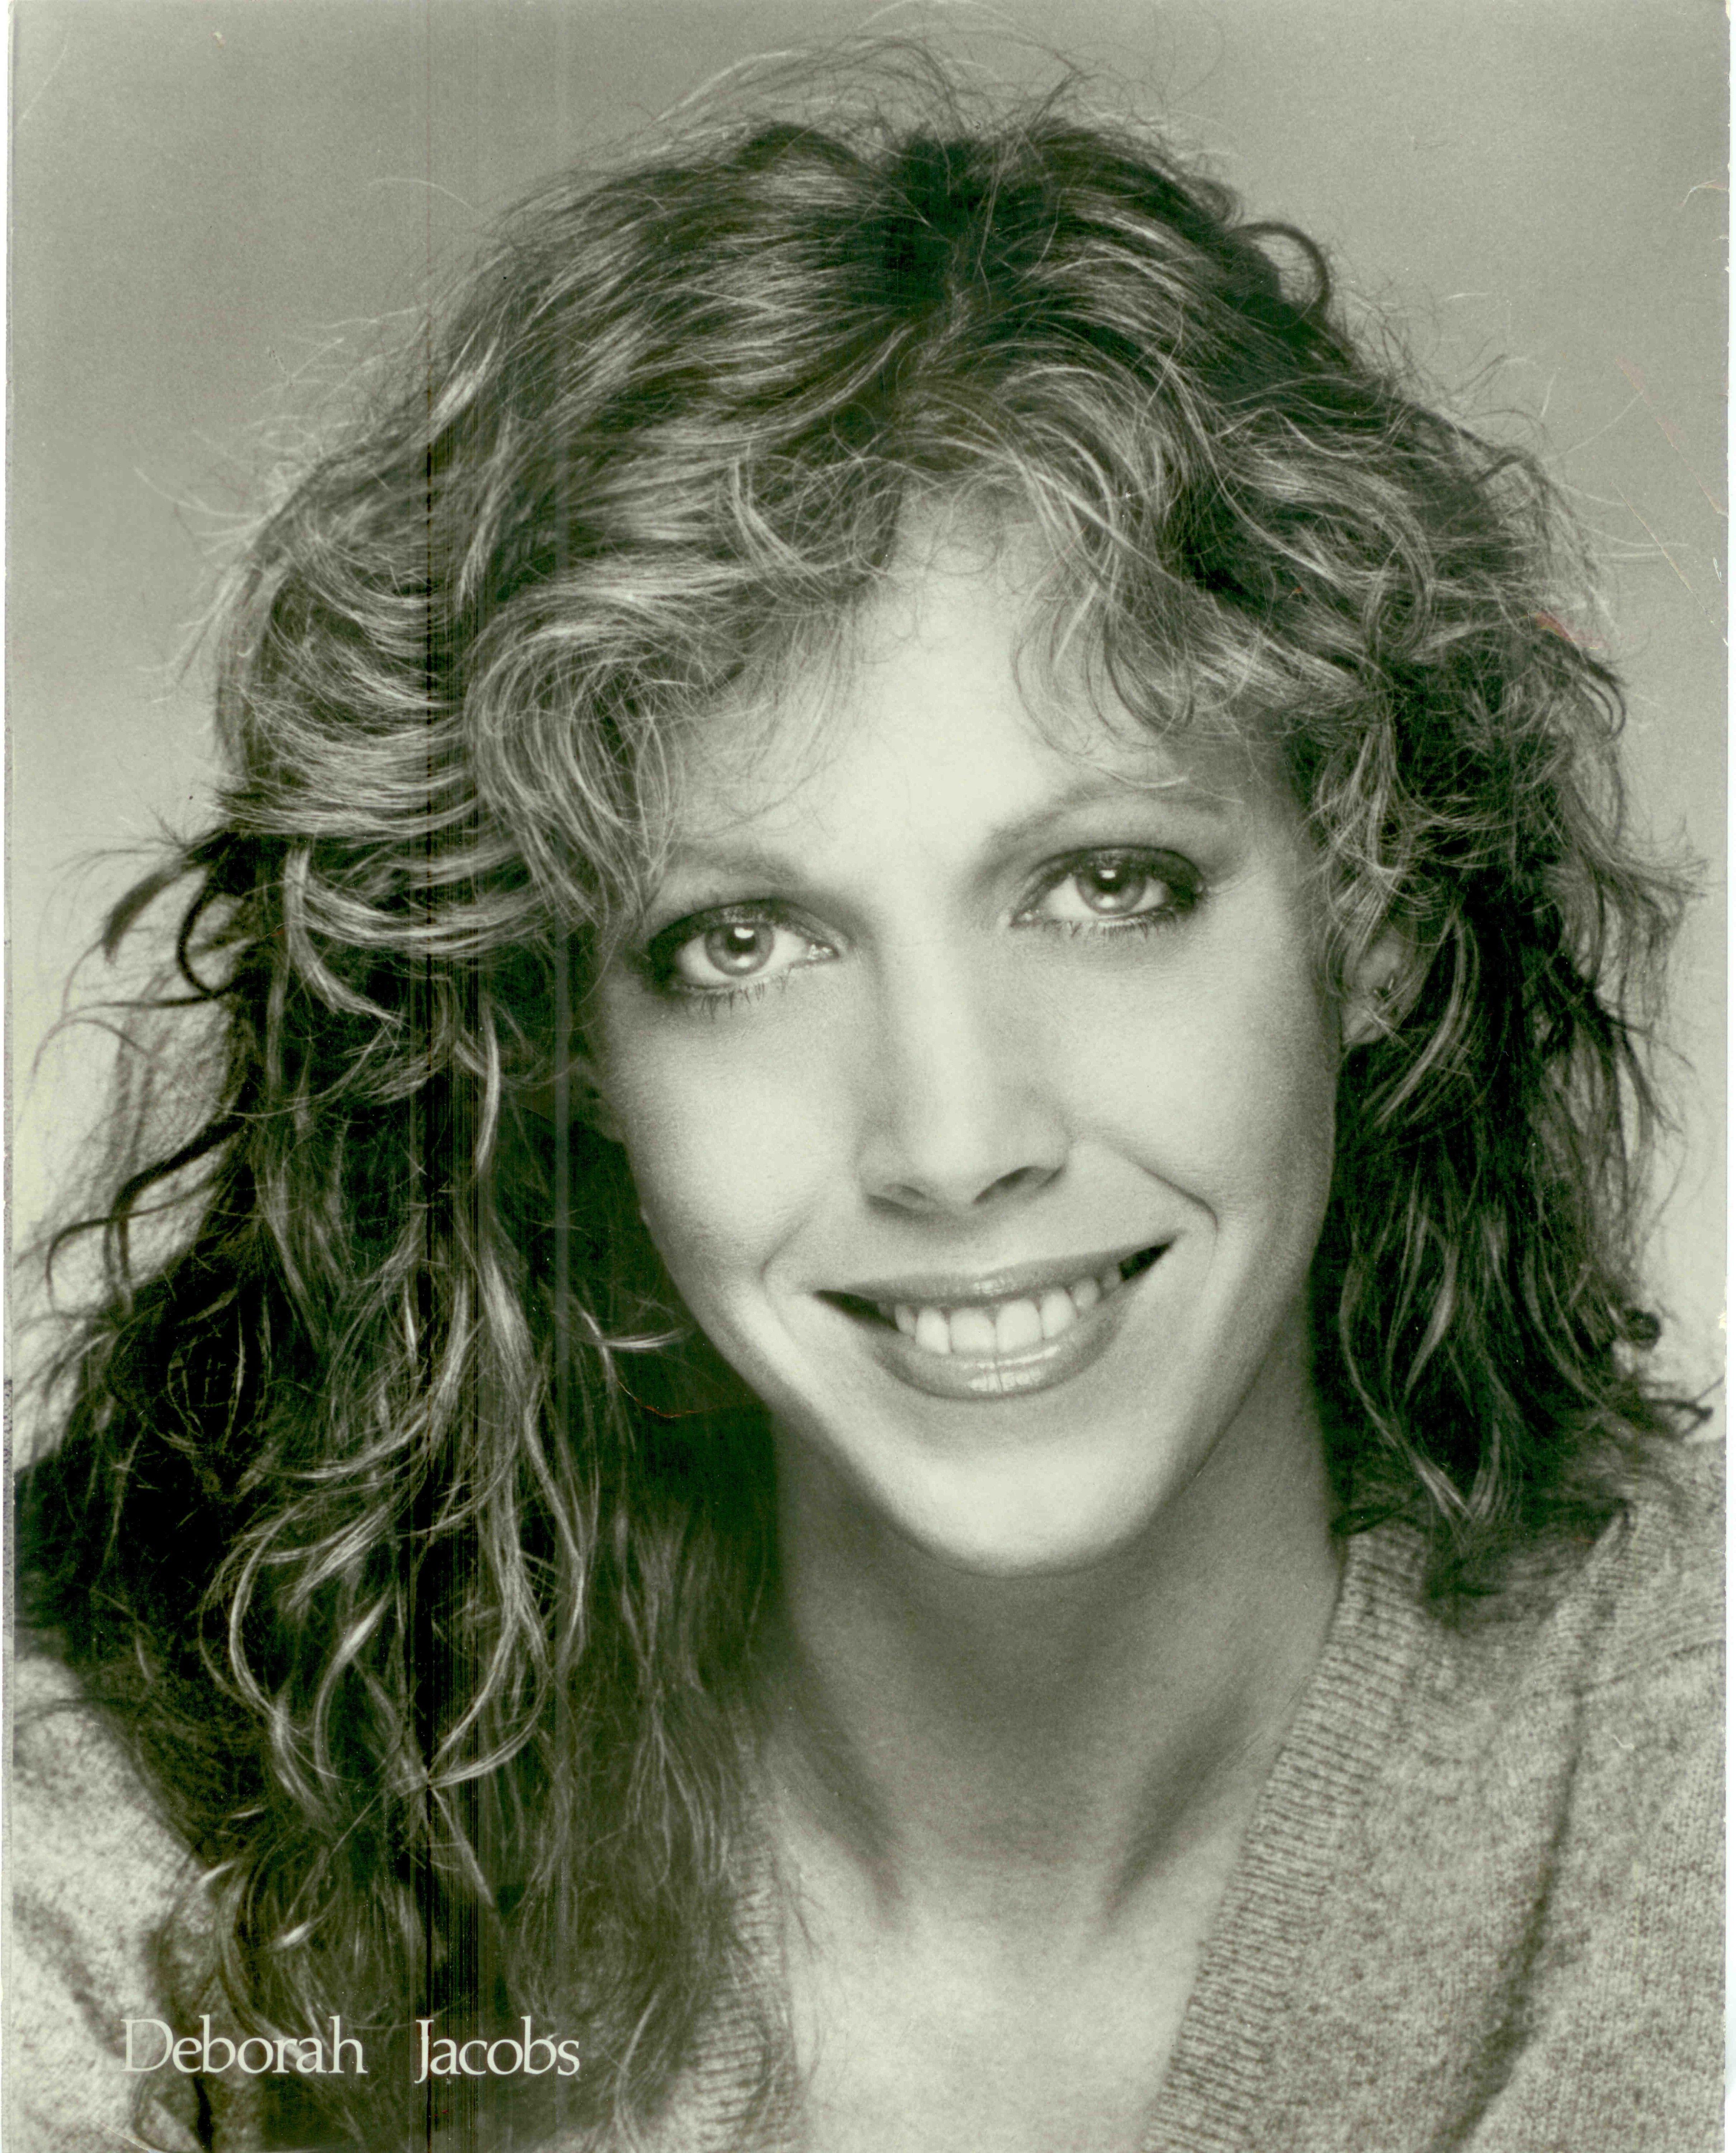 Betty ong s 9 11 call from flight 11 youtube - Deborah Jacobs Welsh Flight Attendant On Flight 93